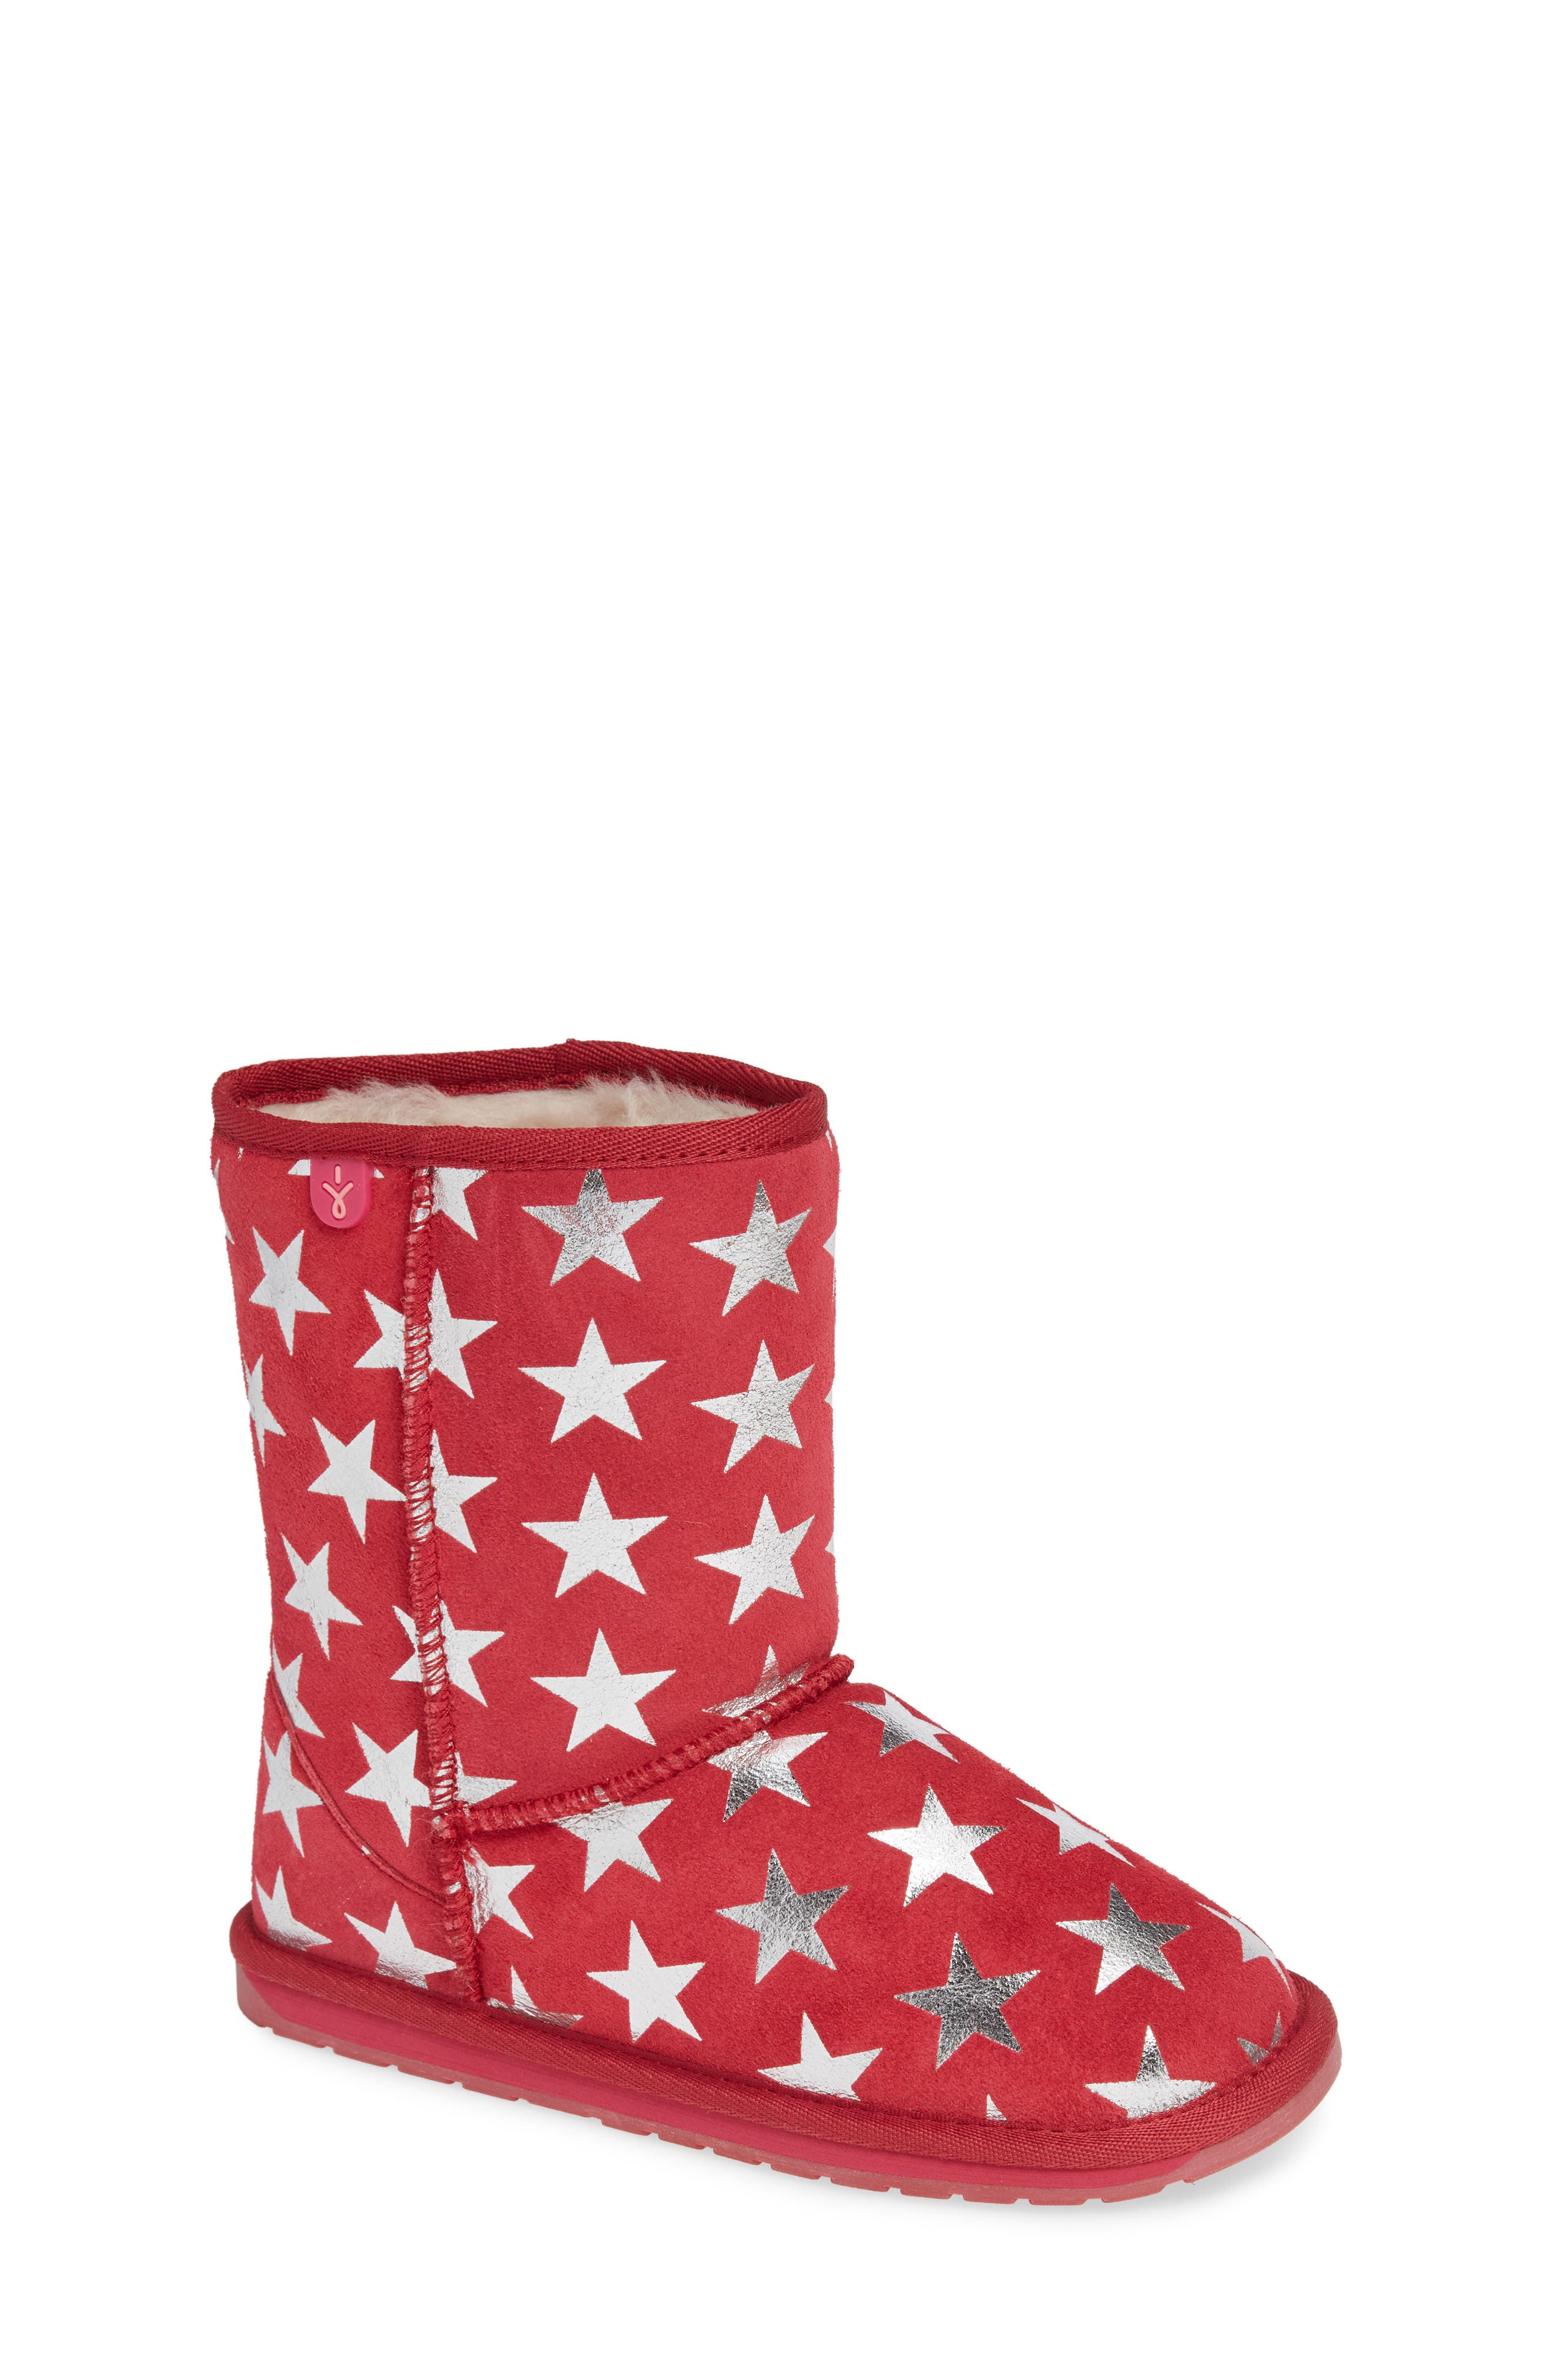 EMUAustralia Starry Night Boot,                         Main,                         color, Fuchsia